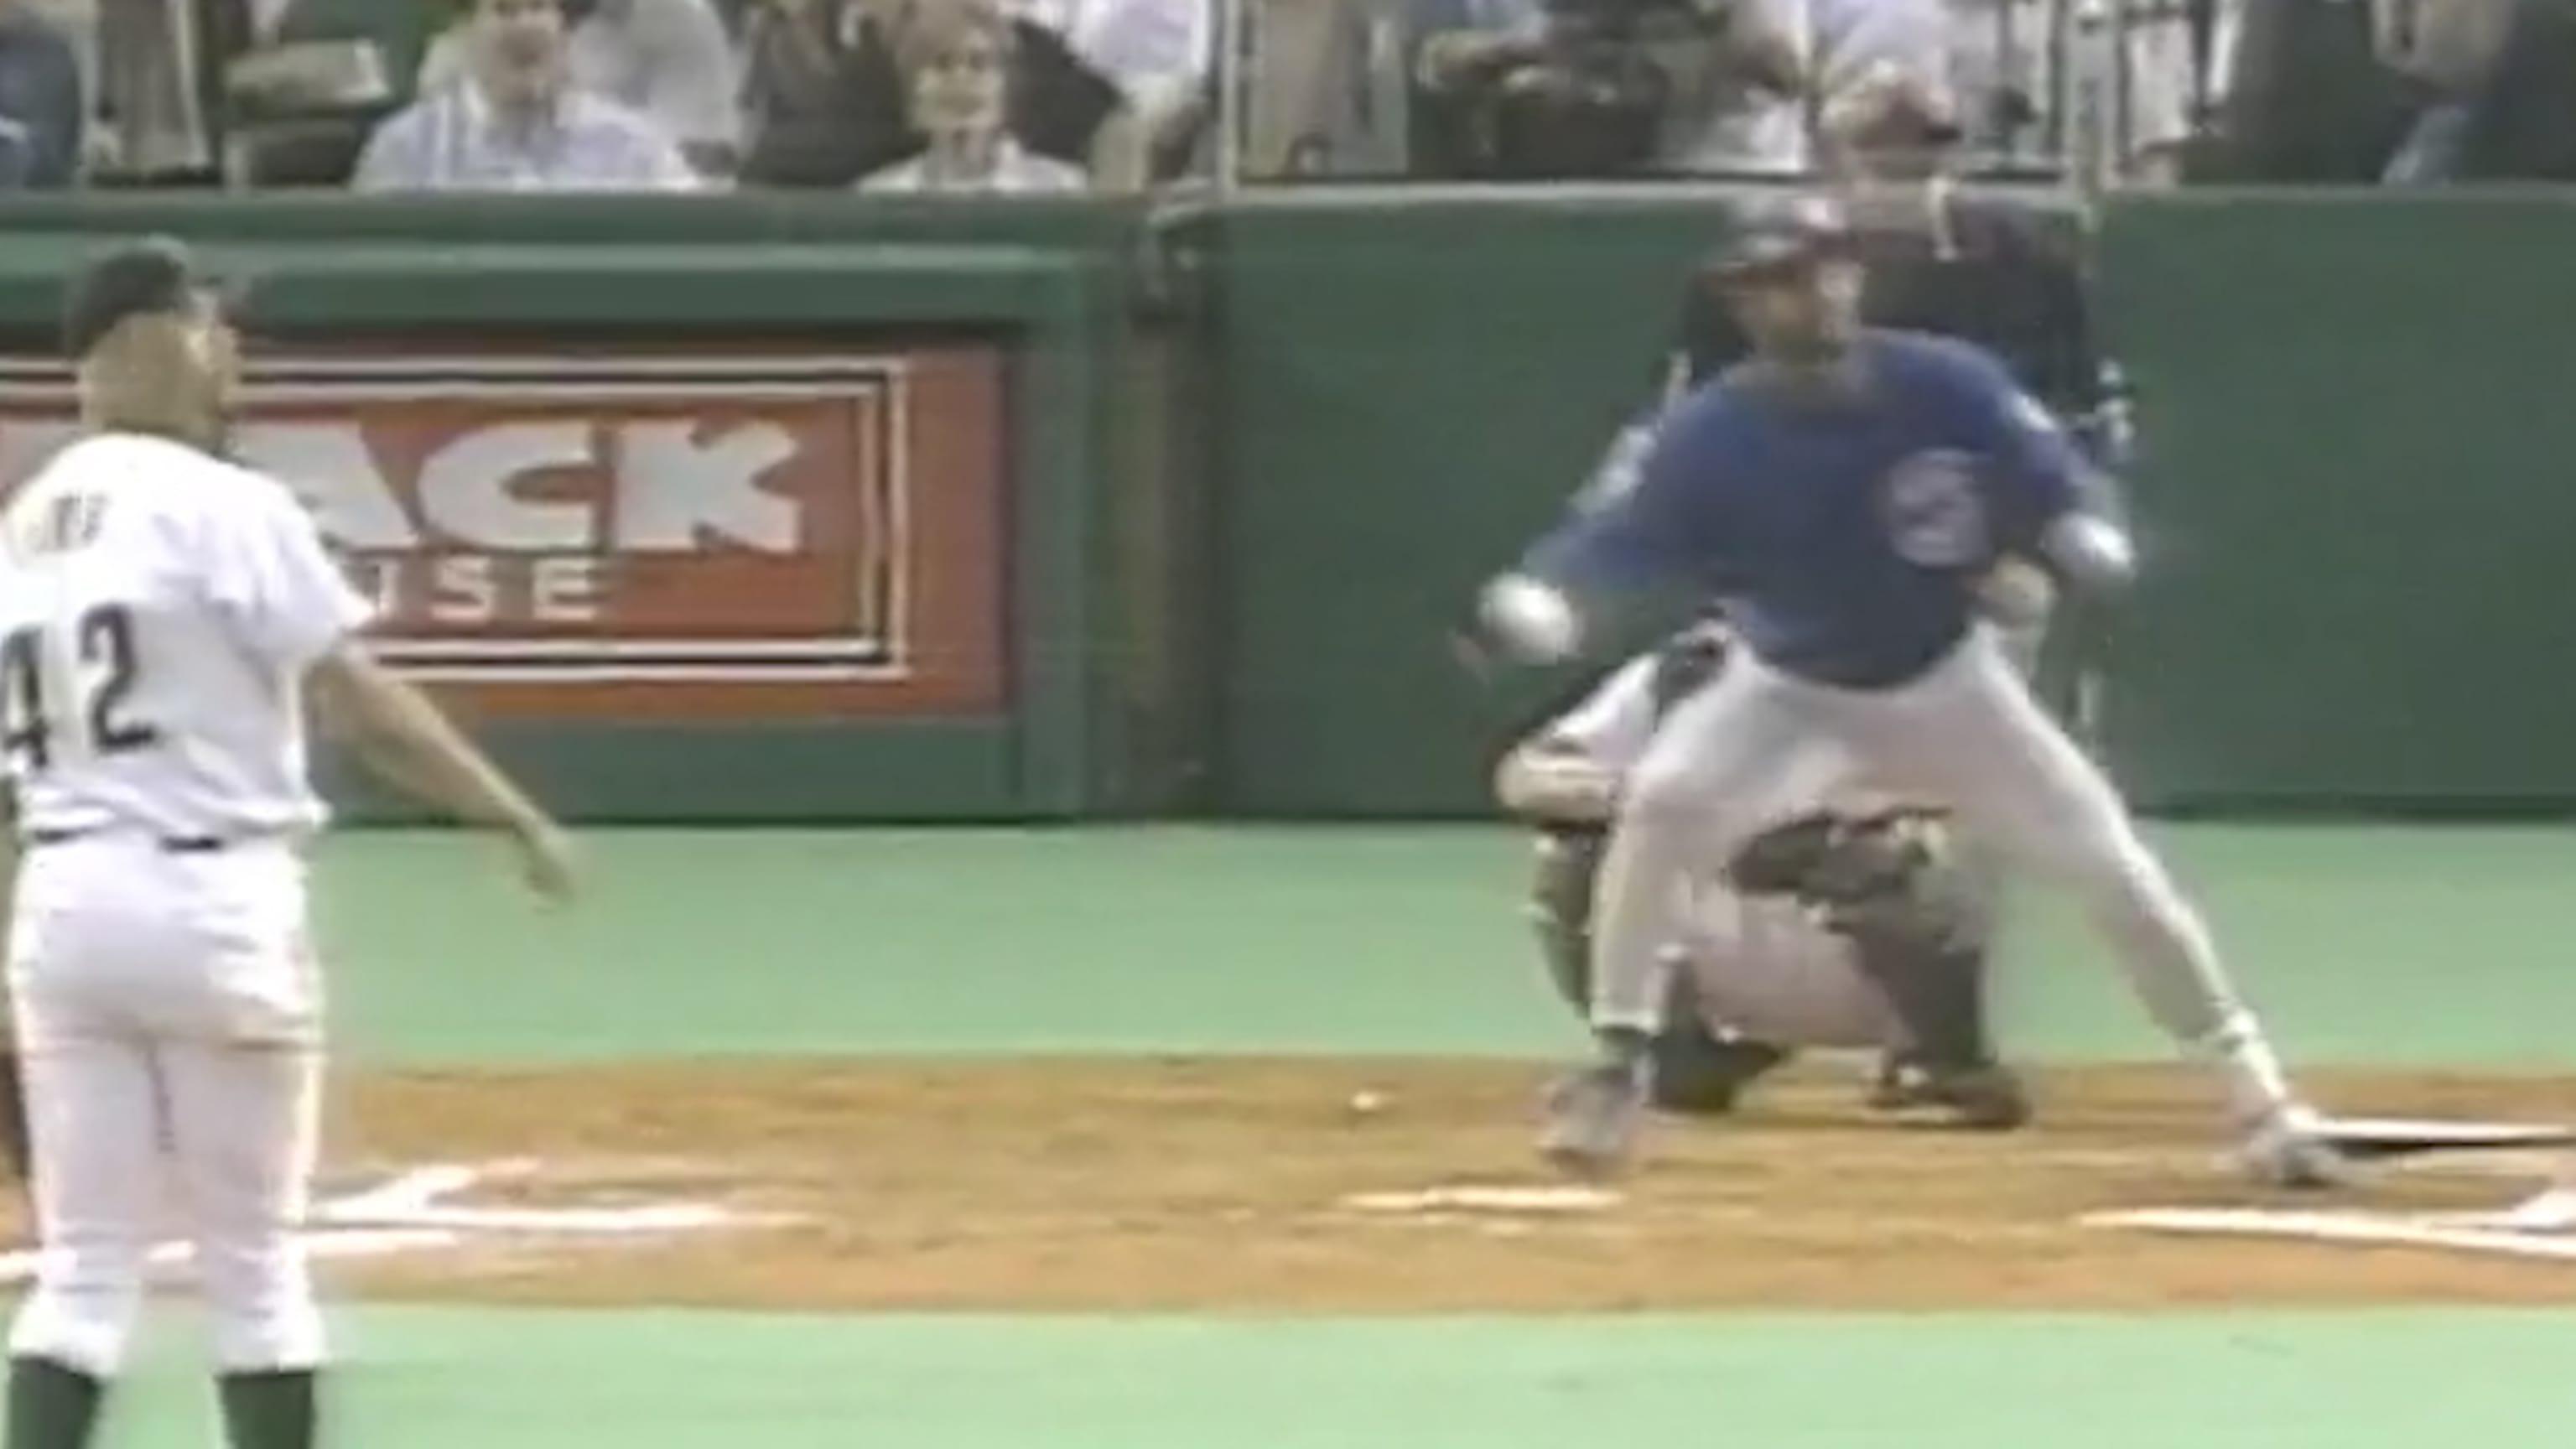 Sosa's 66th home run of 1998